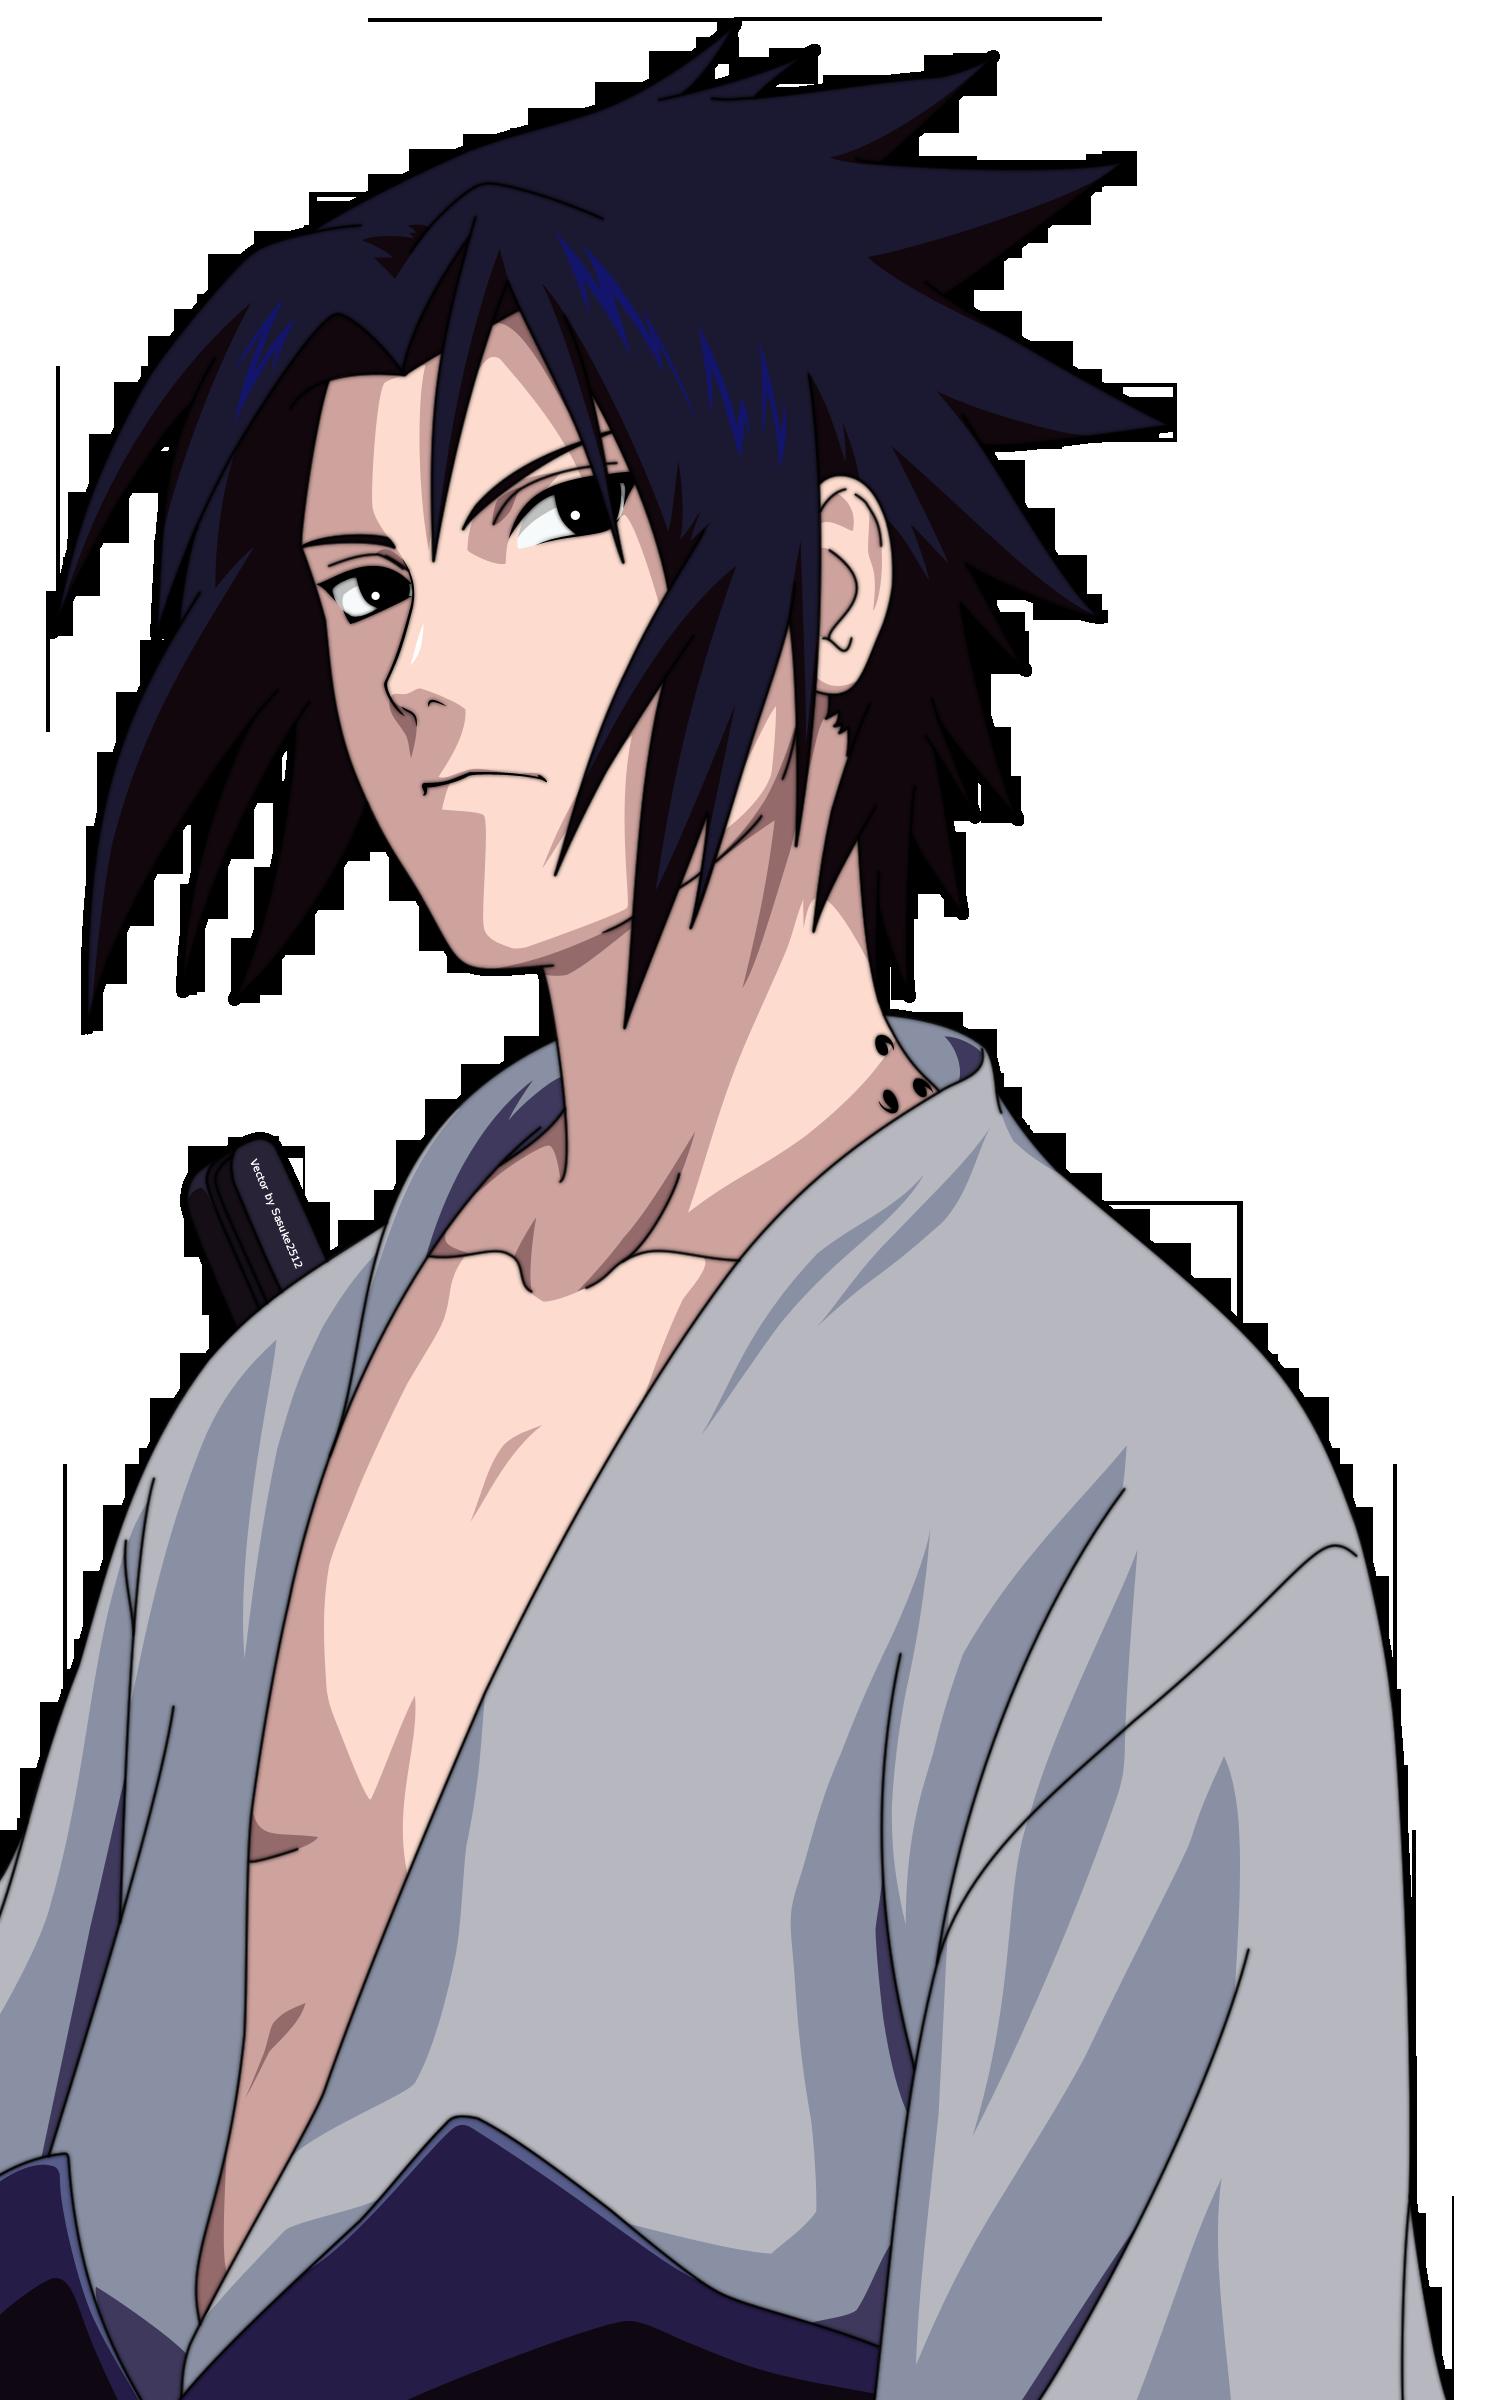 Download Uchiha Sasuke Transparent Picture HQ PNG Image ... - Emo Sasuke